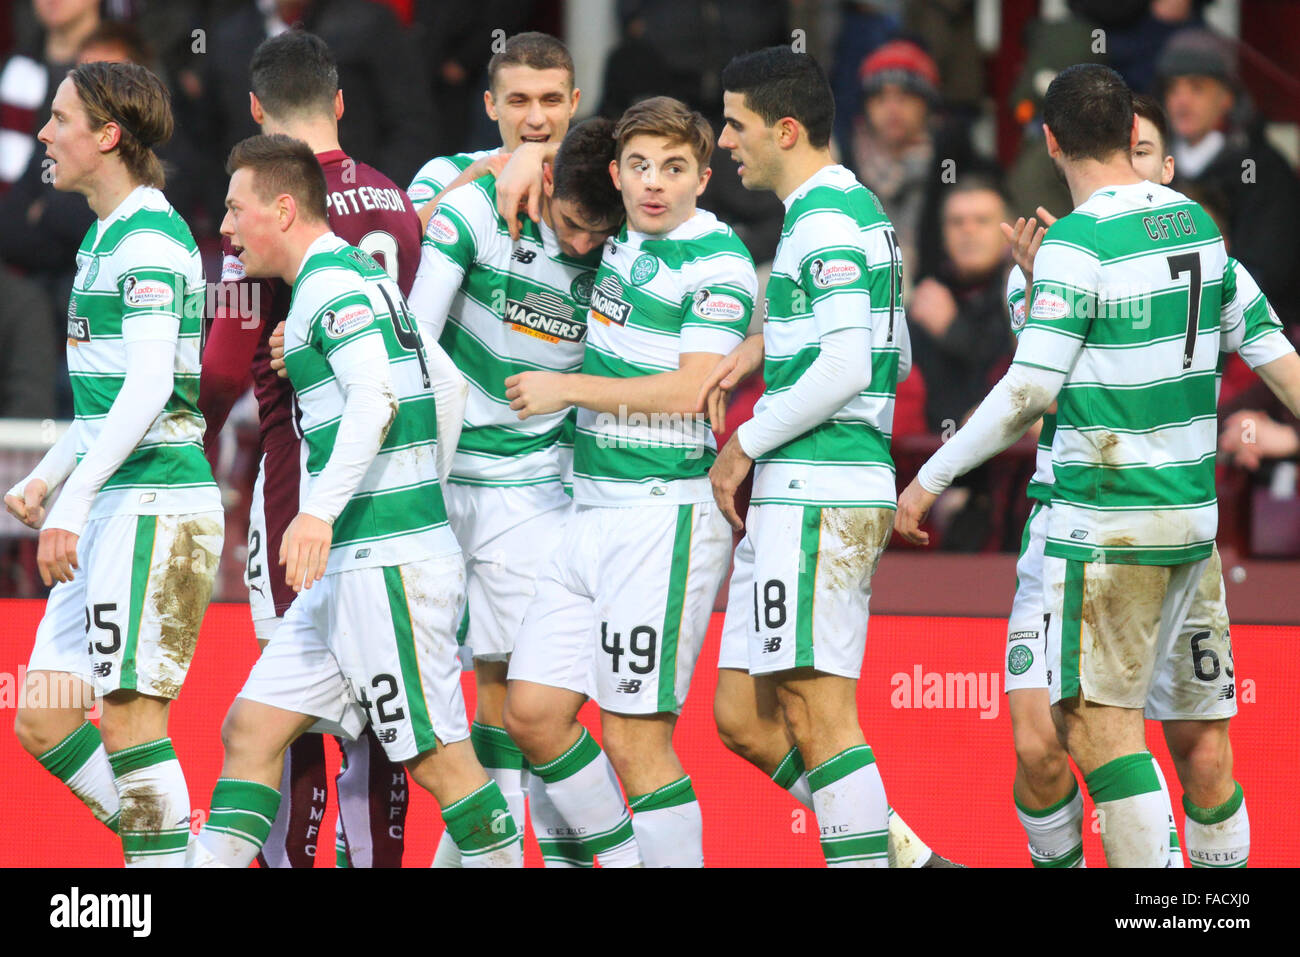 Tynecastle Stadium, Edinburgh, Scotland. 27th Dec, 2015. Scottish Premier League. Celtic versus Heart of Midlothian. - Stock Image